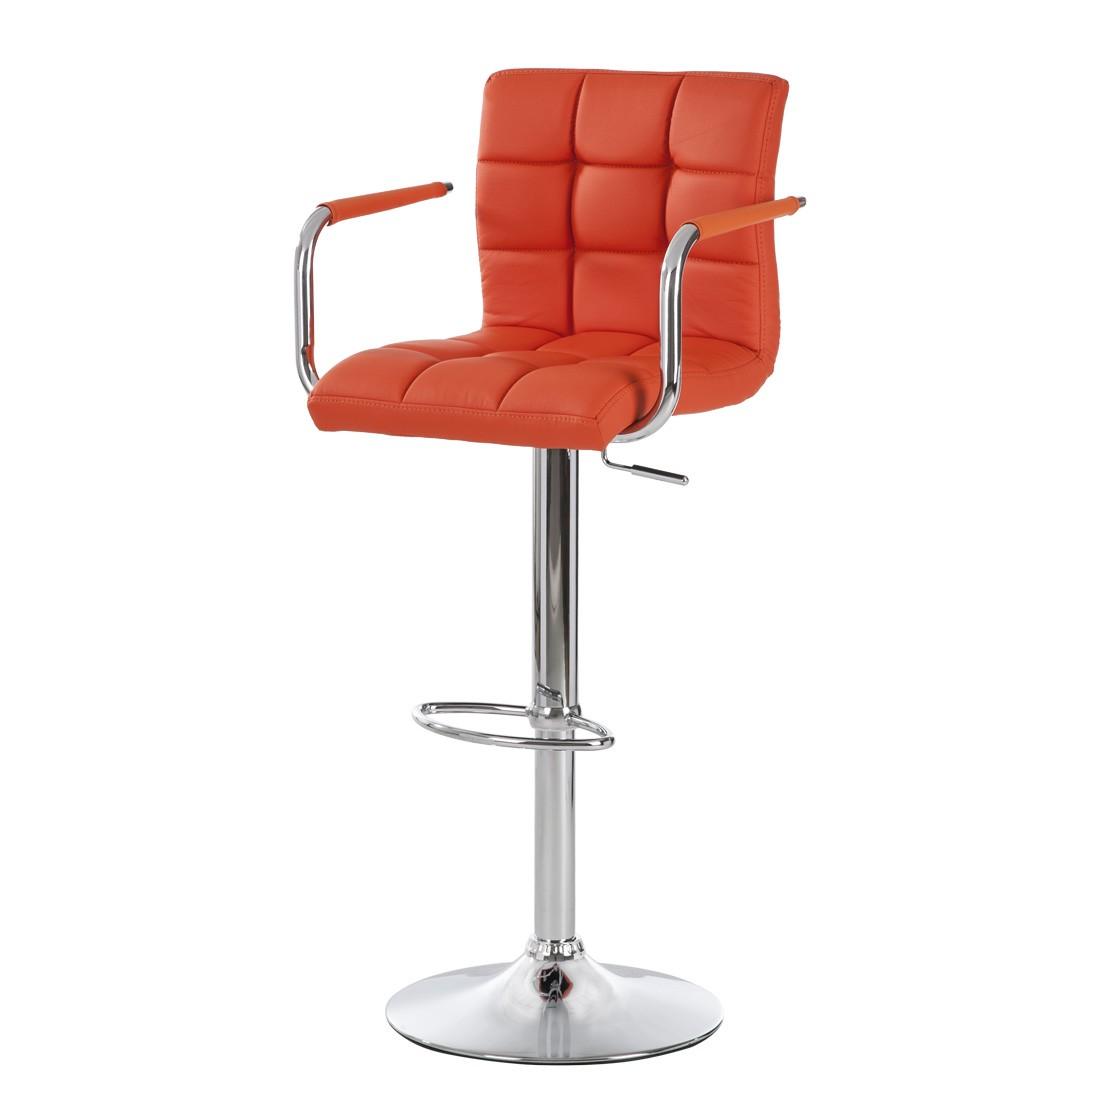 Barhocker Fitzgerald II – Kunstleder Orange, Fredriks jetzt kaufen